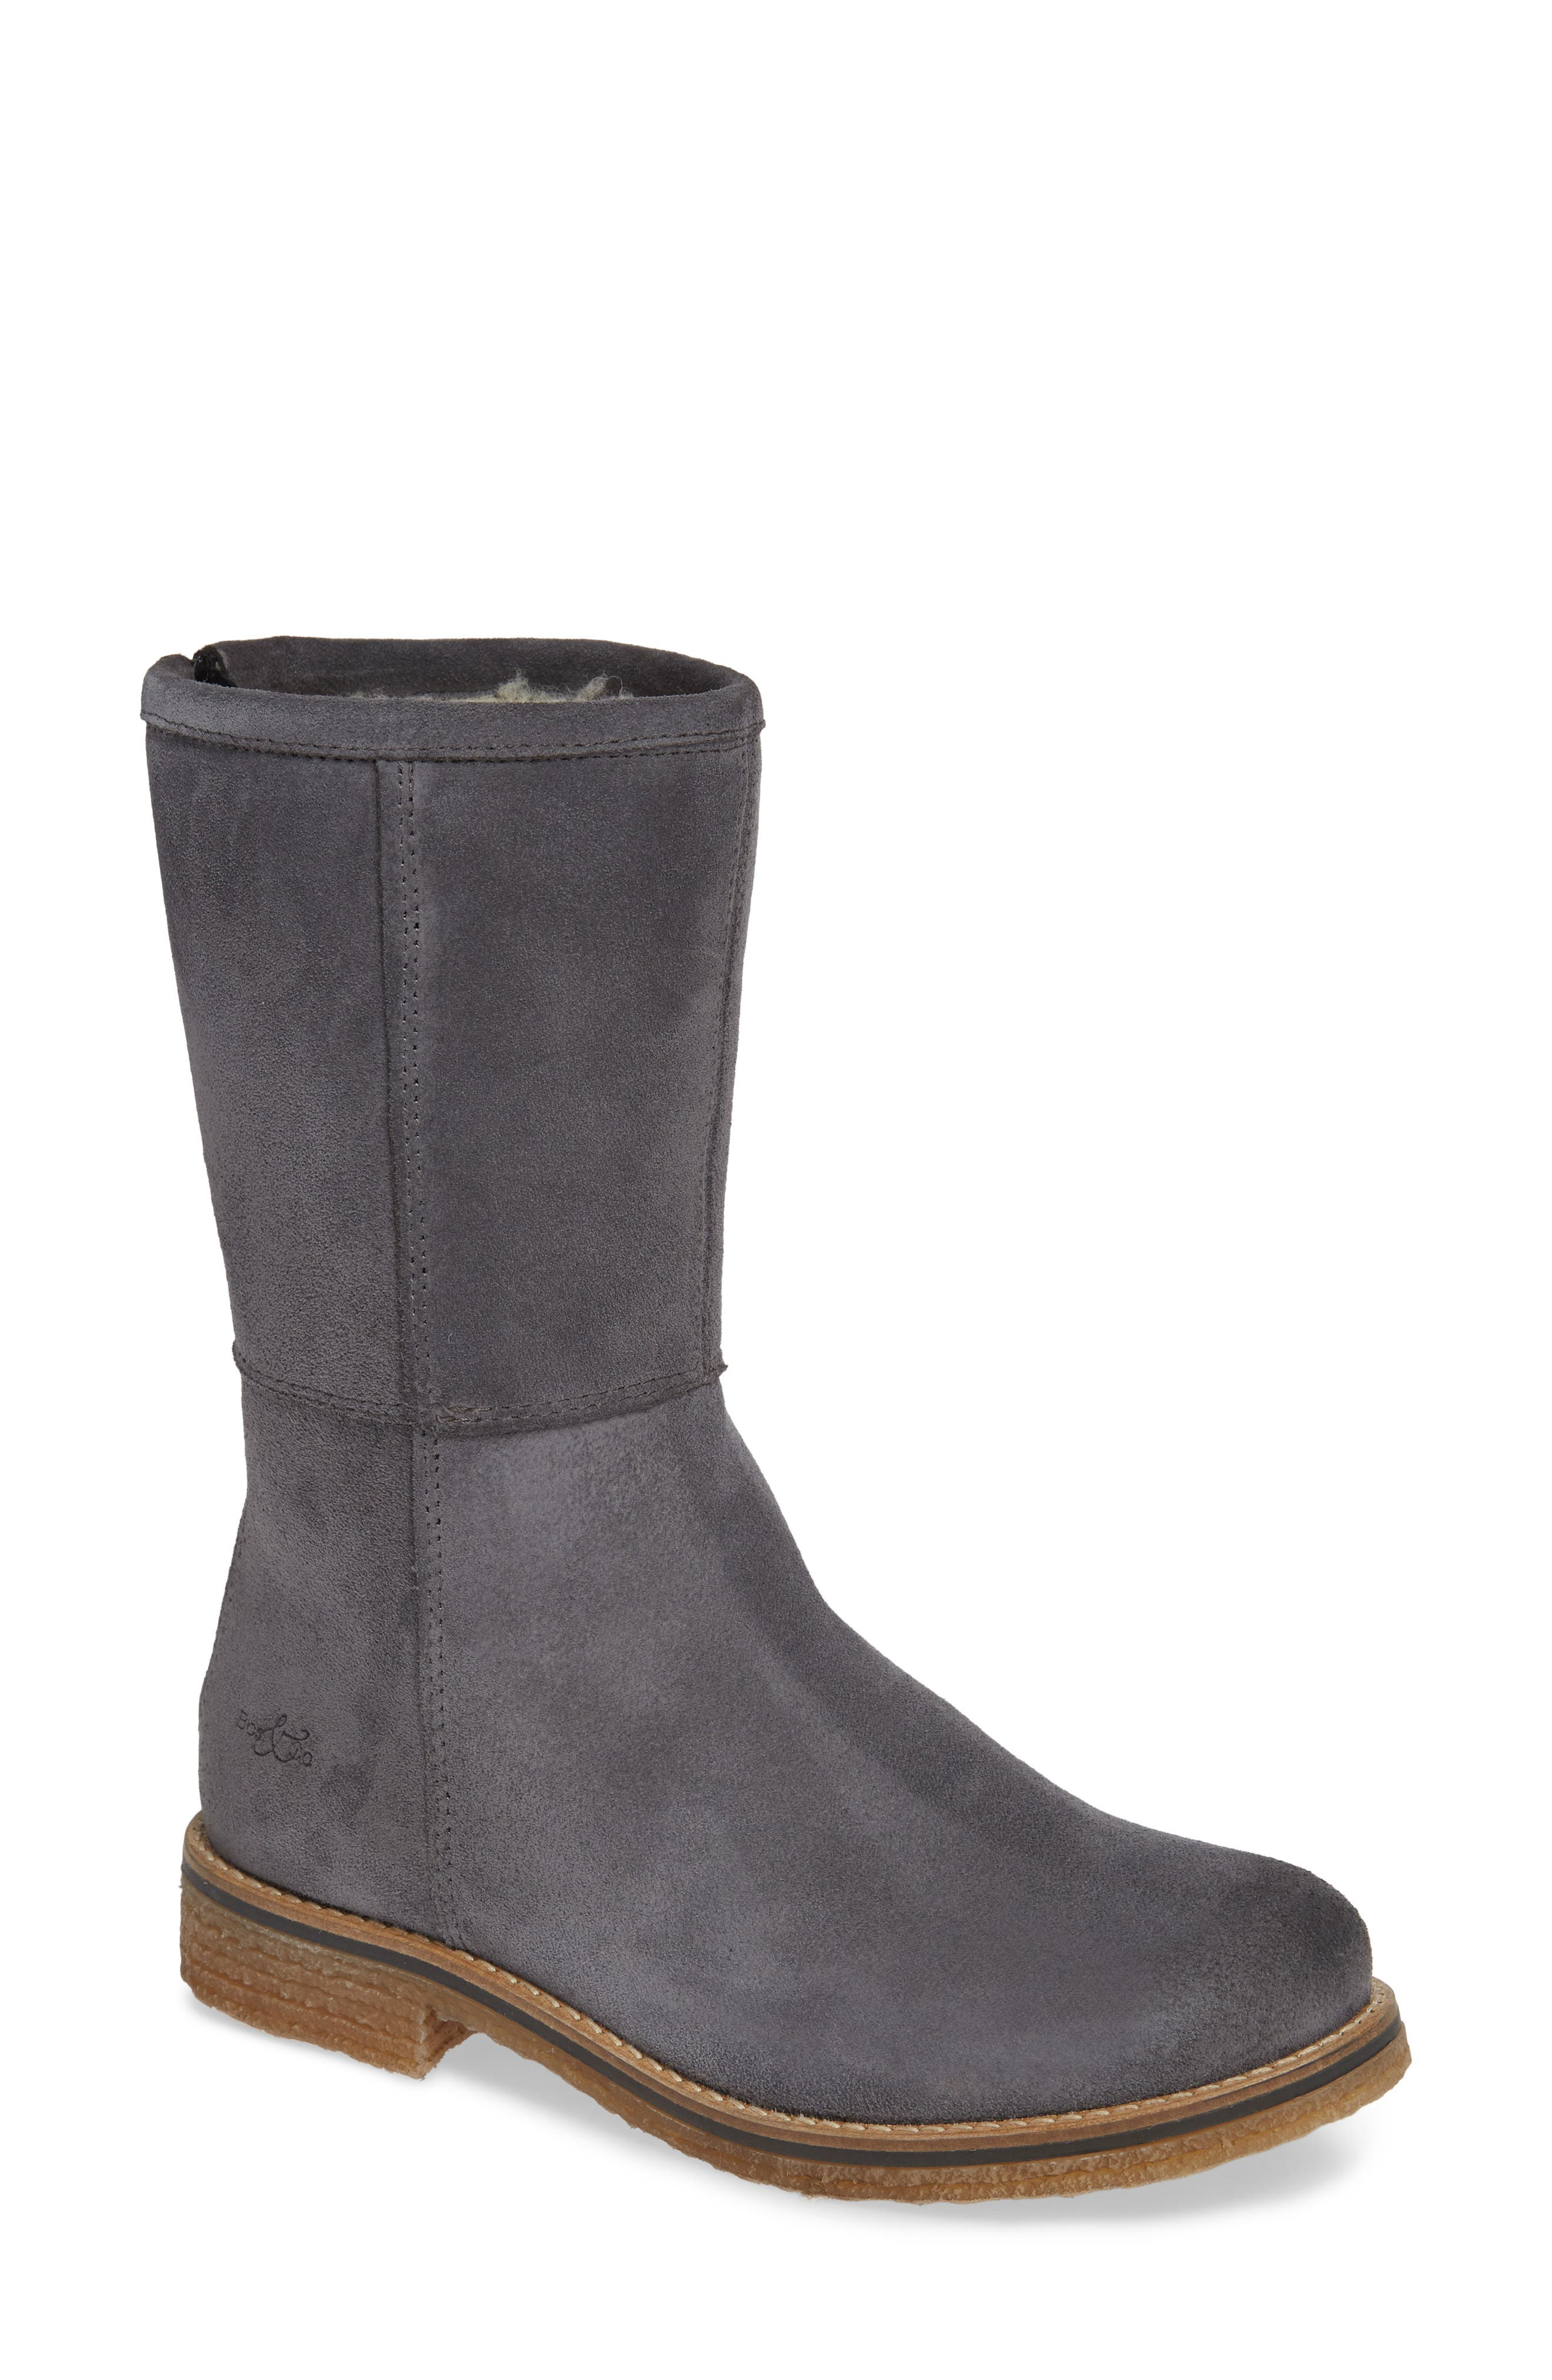 BOS. & CO. Bell Waterproof Winter Boot, Main, color, GREY SUEDE